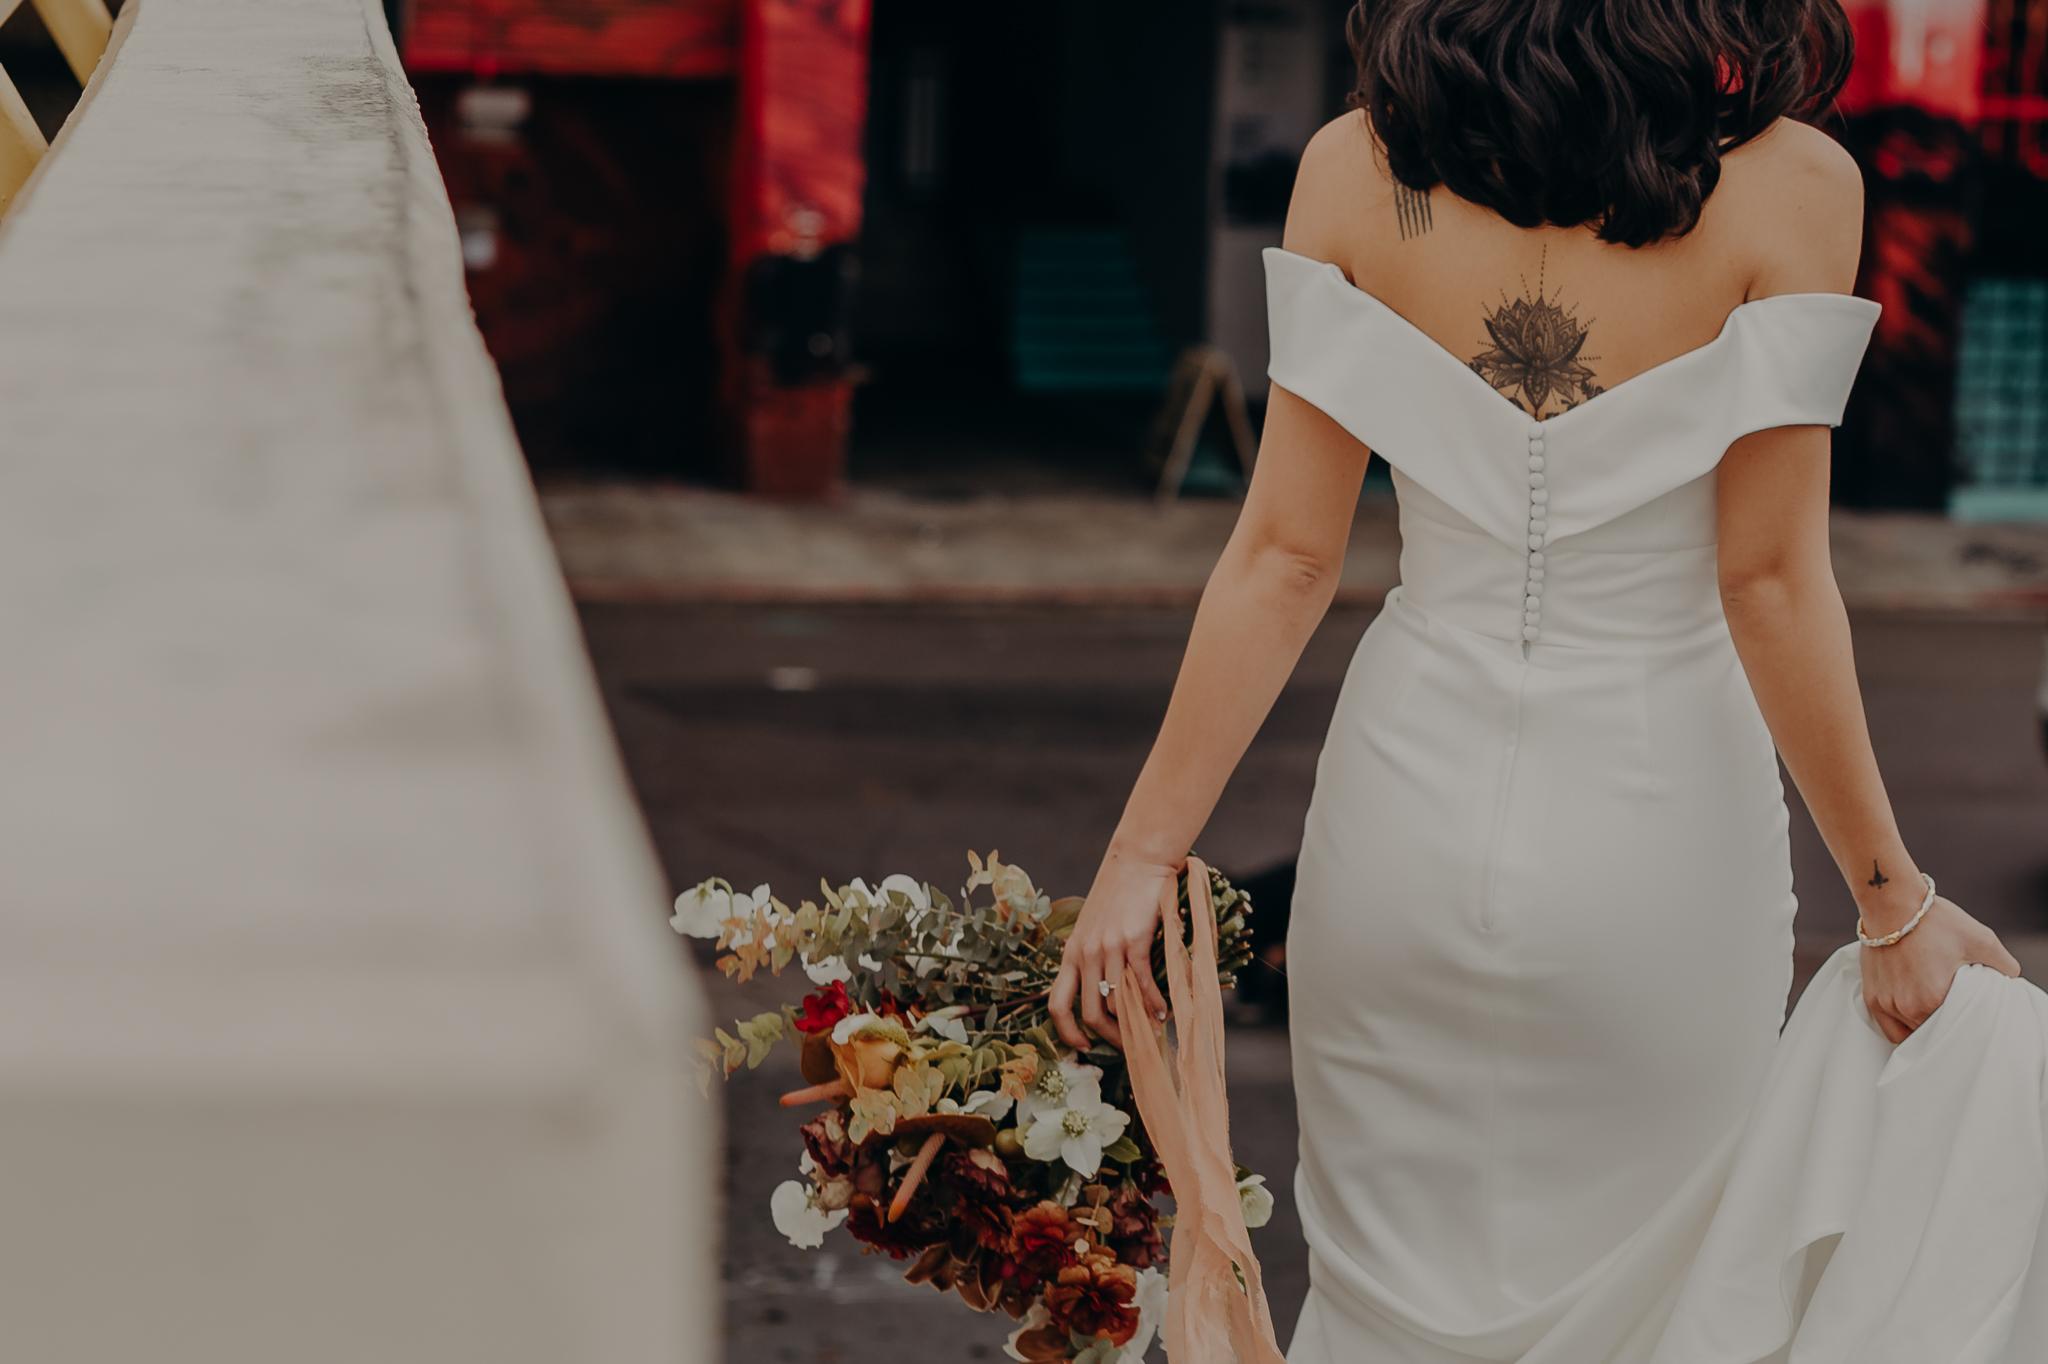 Wedding Photo LA - wedding photographer in los angeles - millwick wedding venue -isaiahandtaylor.com-078.jpg